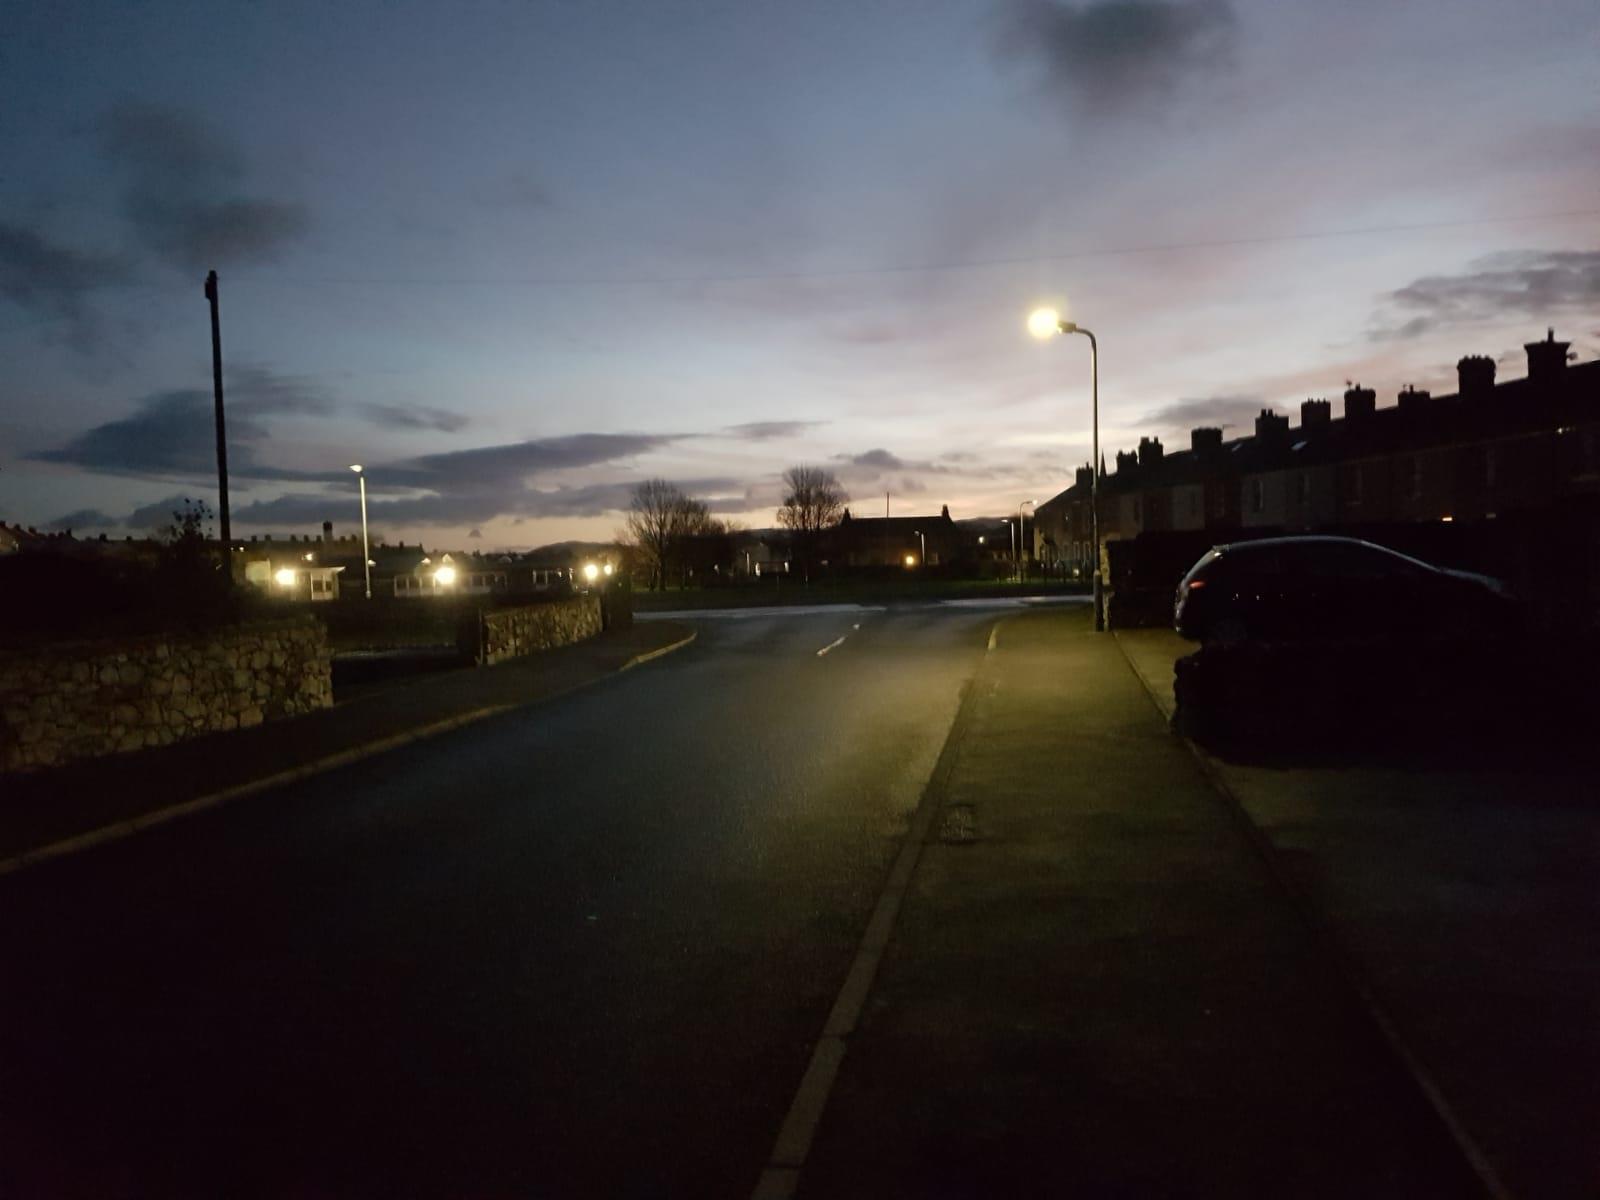 #MySundayPhoto - Winter Walks At Sunrise